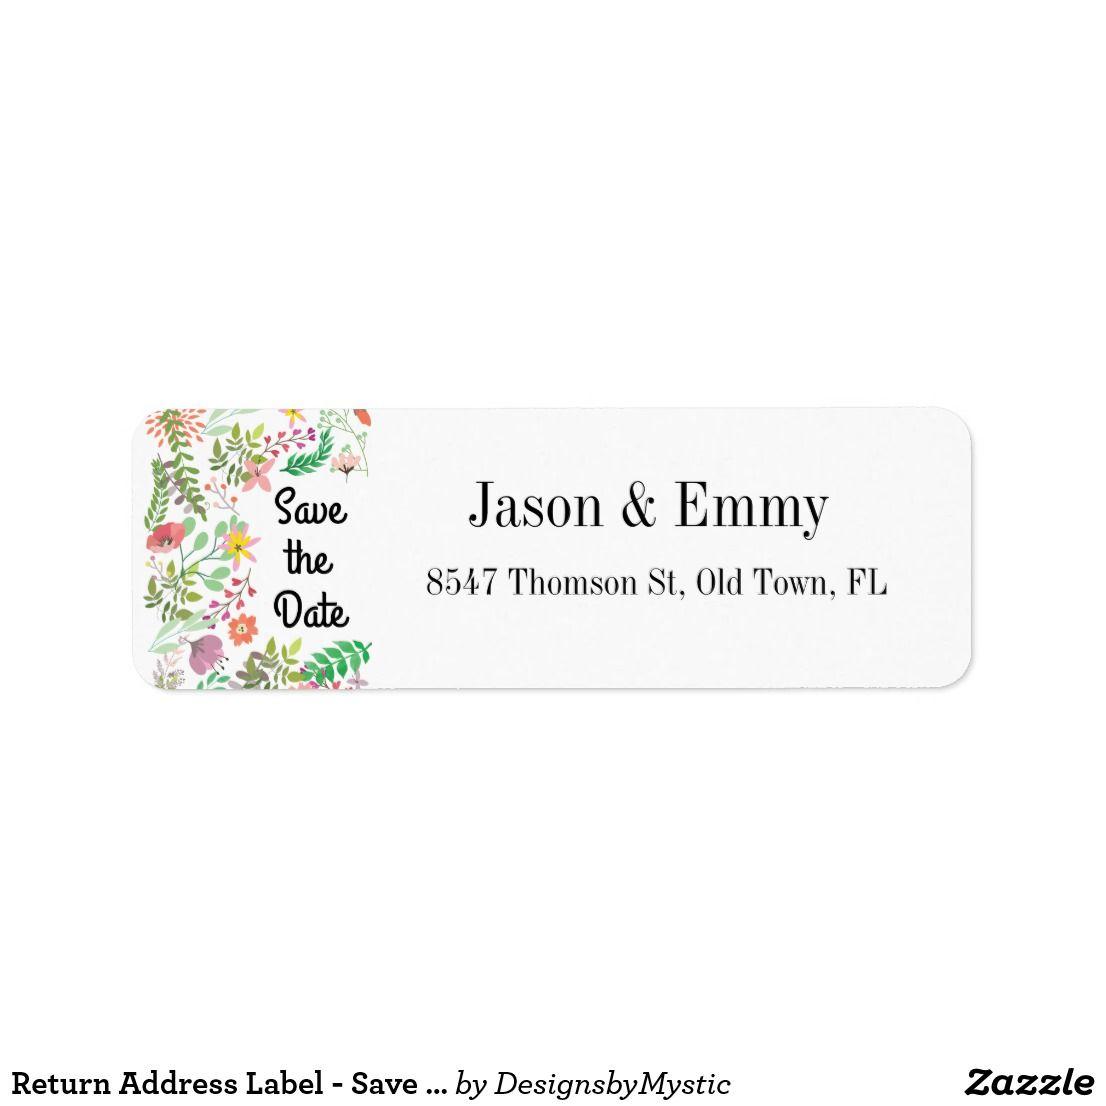 return address label save the date floral theme wedding labels